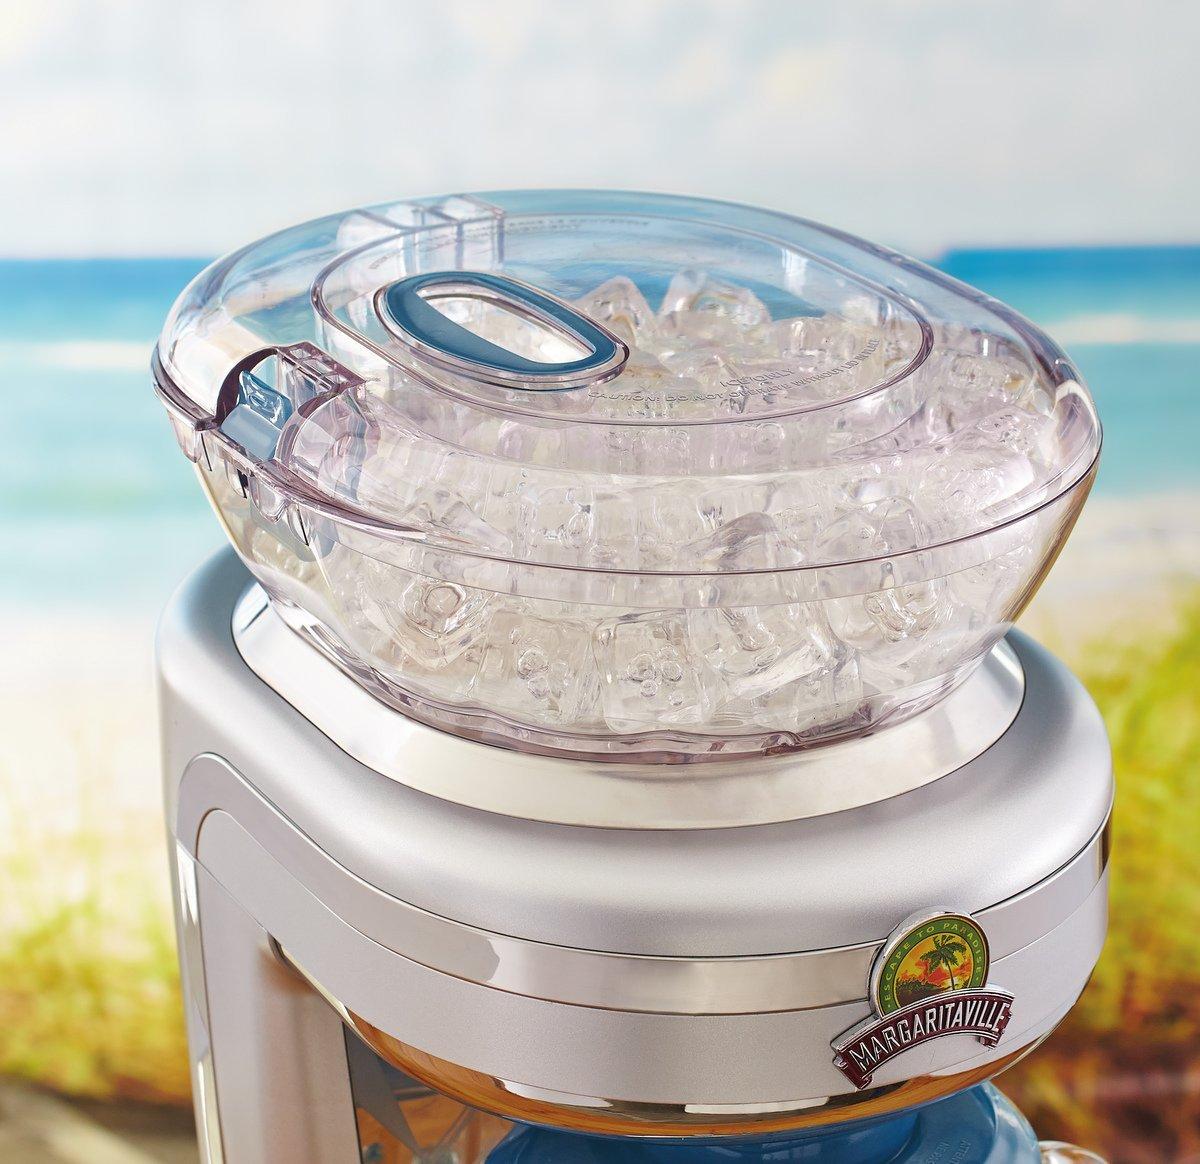 Margaritaville Key West Frozen Concoction Maker with Easy Pour Jar and XL Ice Reservoir, DM1900 by Margaritaville (Image #2)